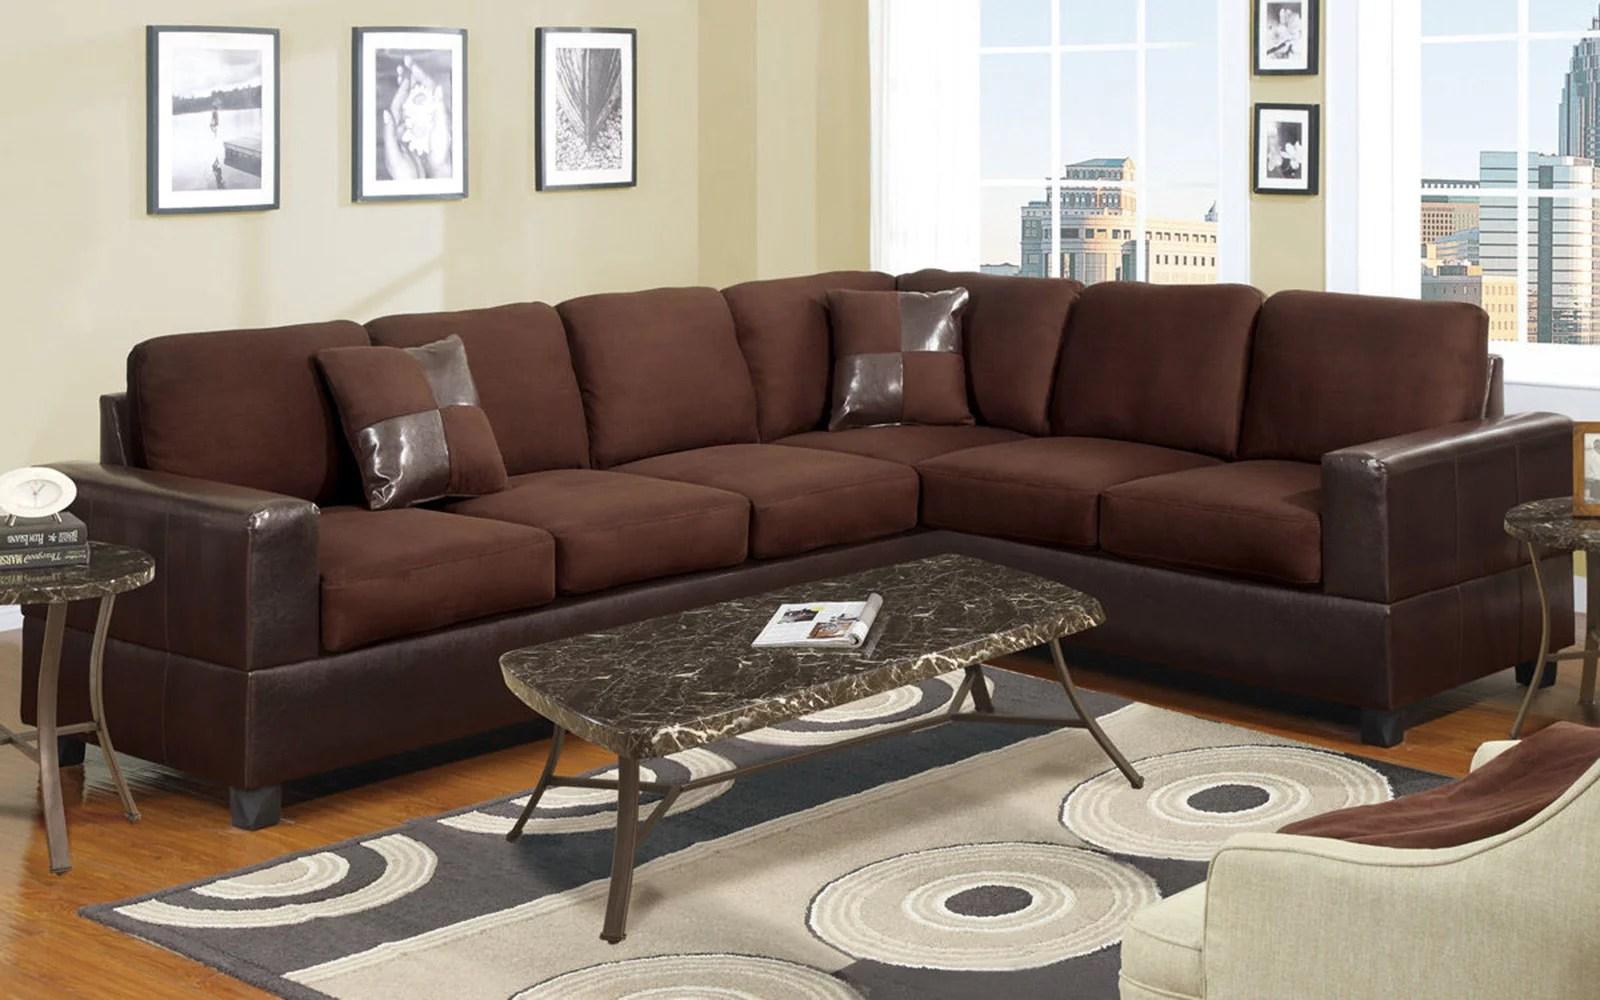 Furniture Village Bristol sectional sofas at walmart | furniture village jobs bristol